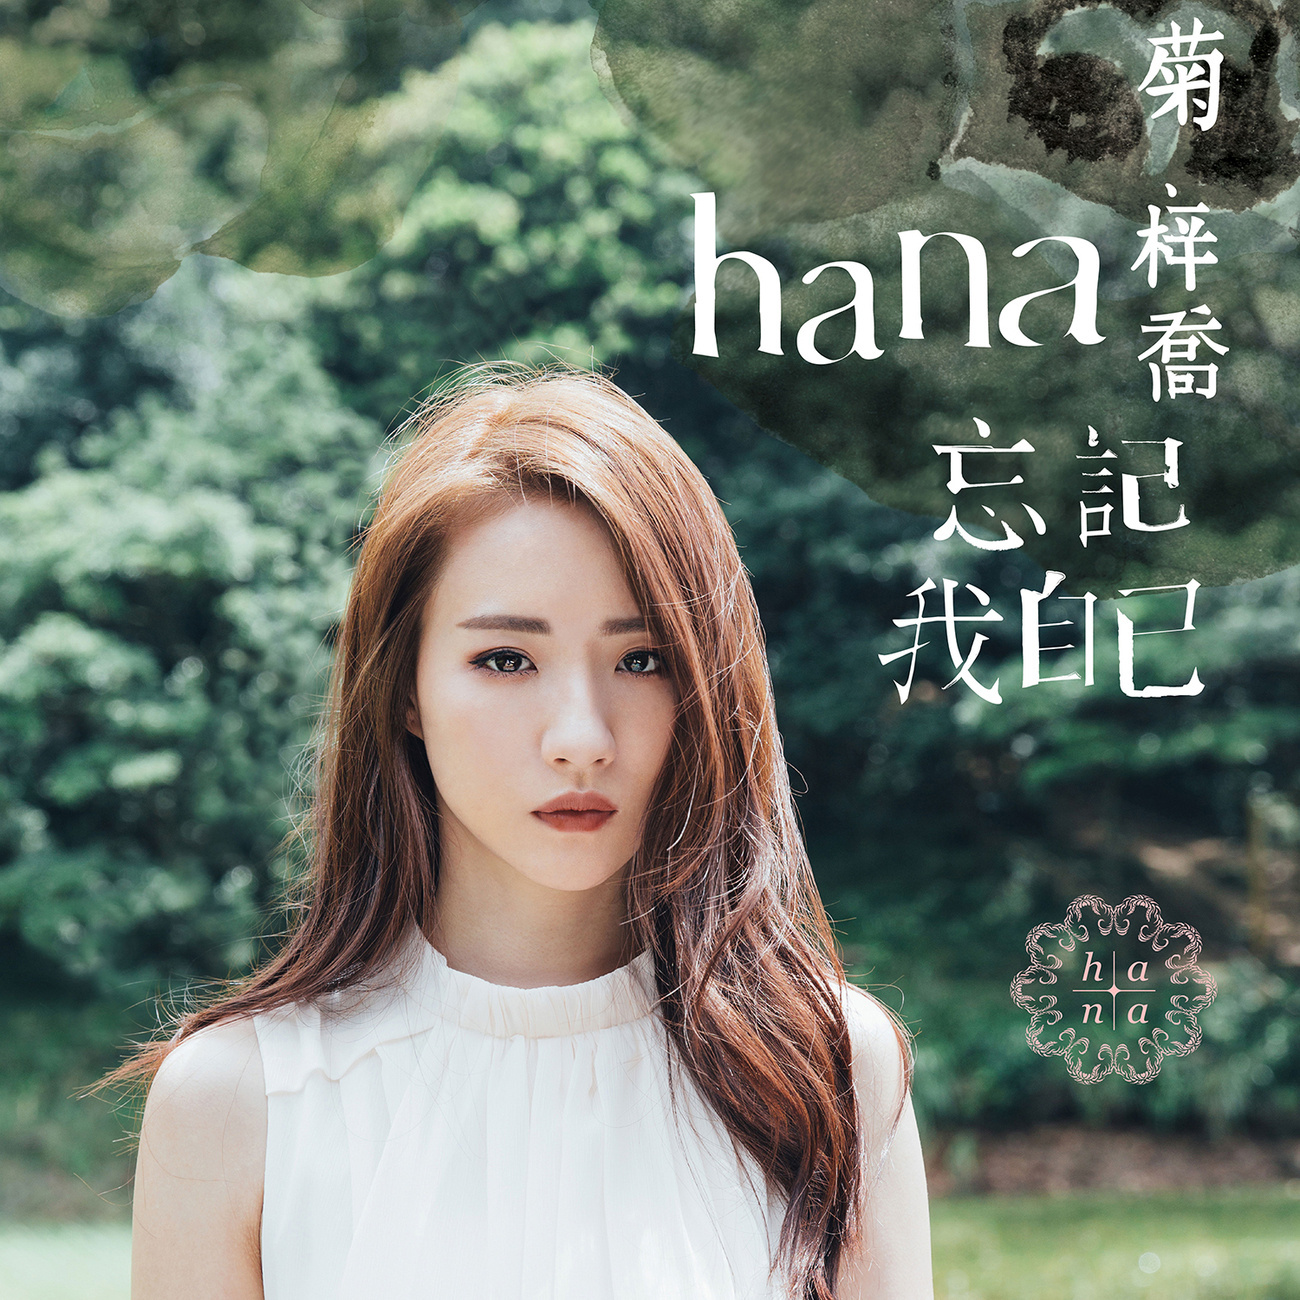 Hana 菊梓乔 忘记我自己